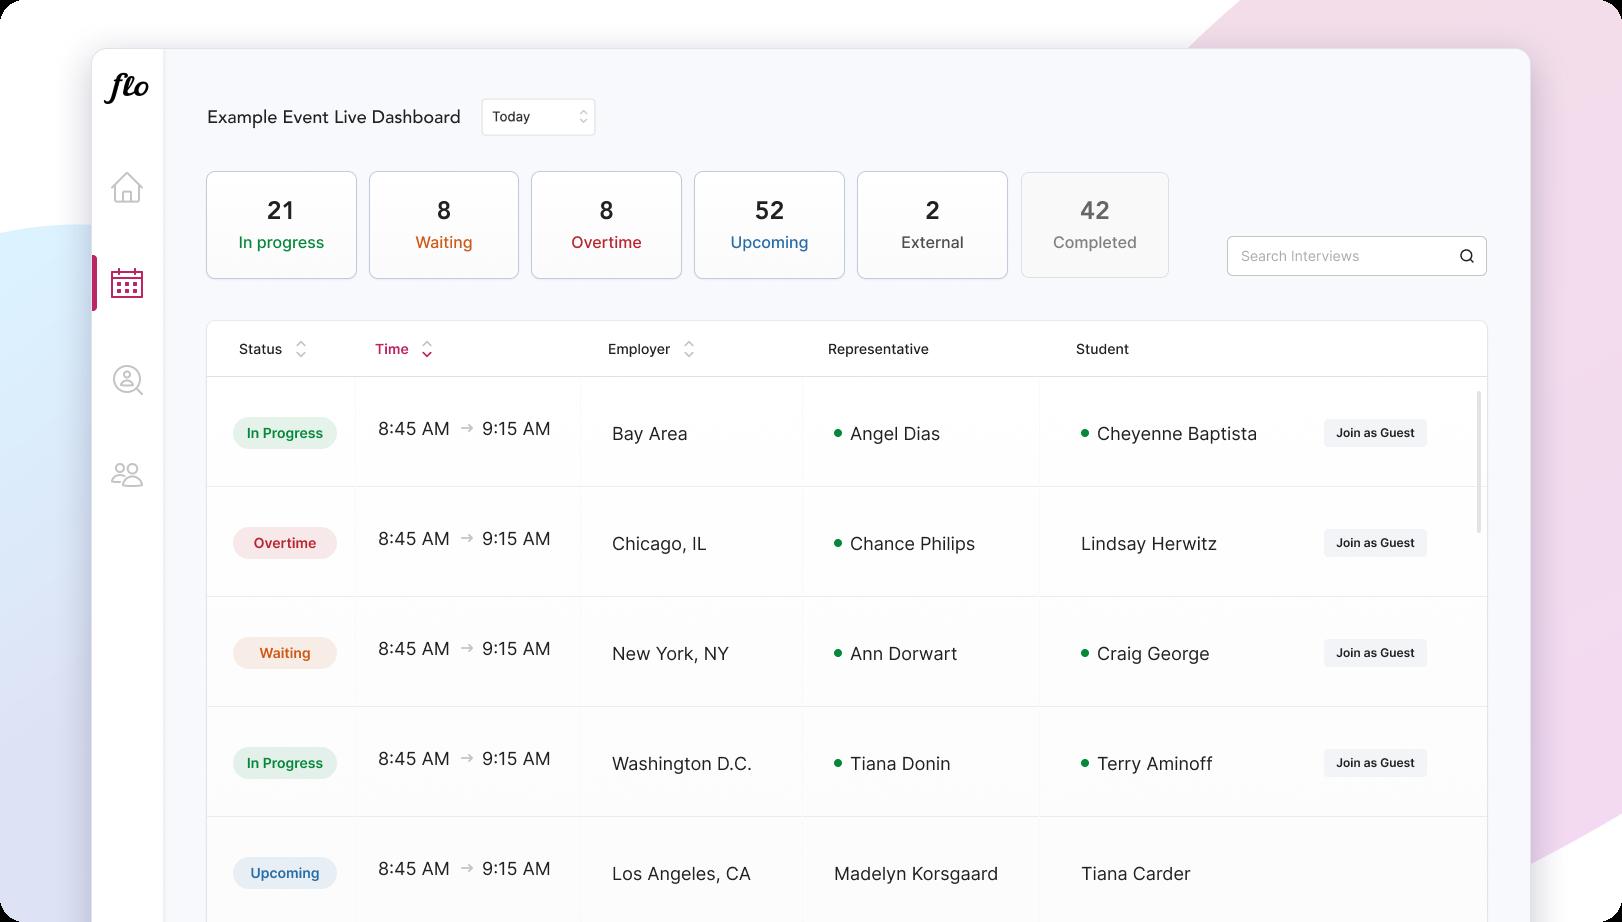 Live Dashboard Small Screen enhancements